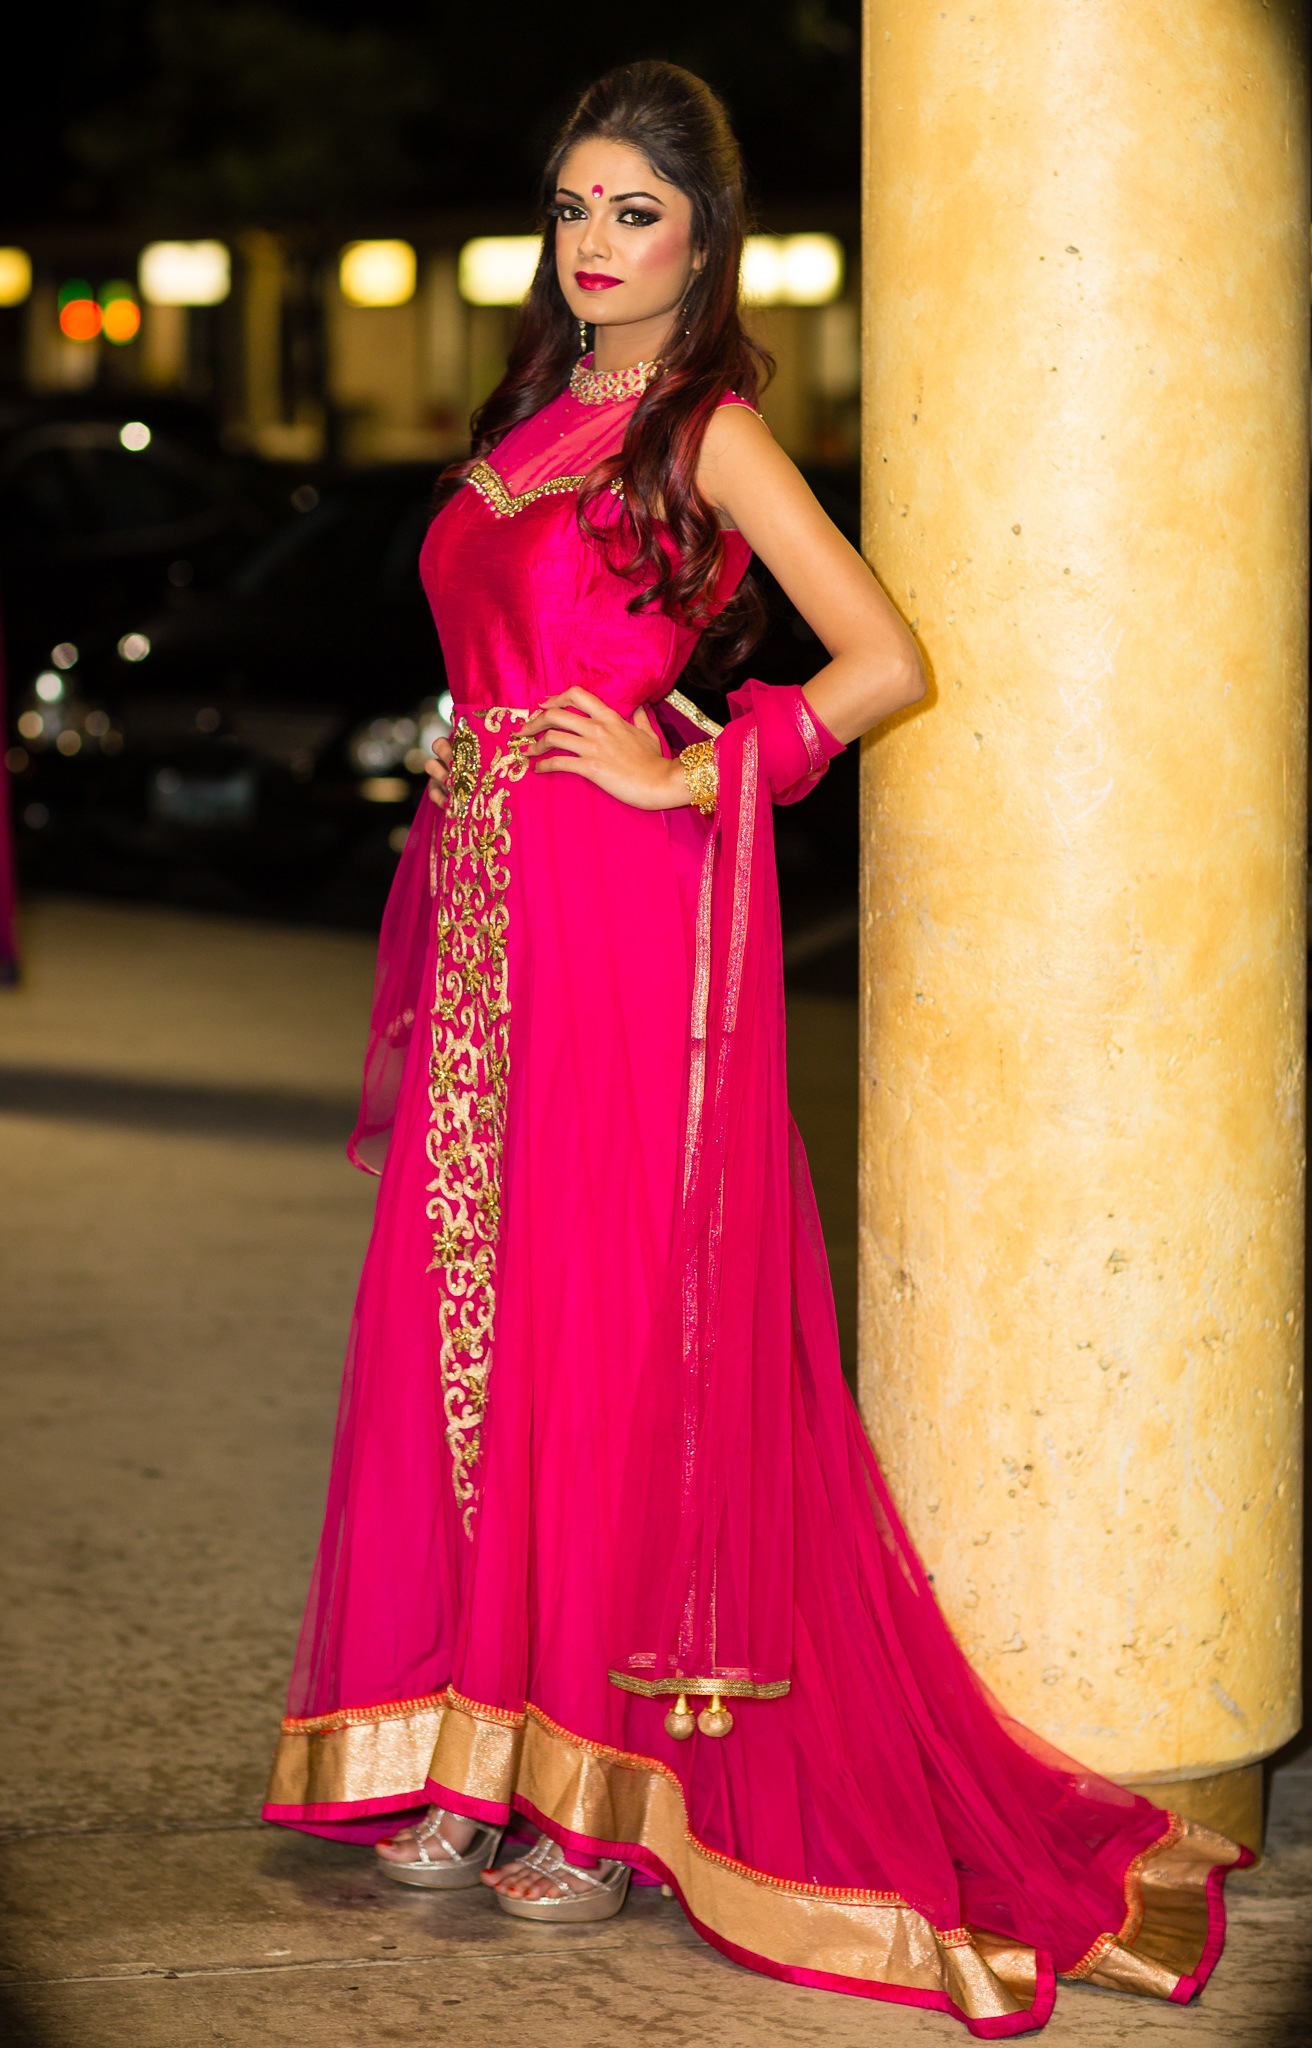 Pretty In Pink by Vik Kumar